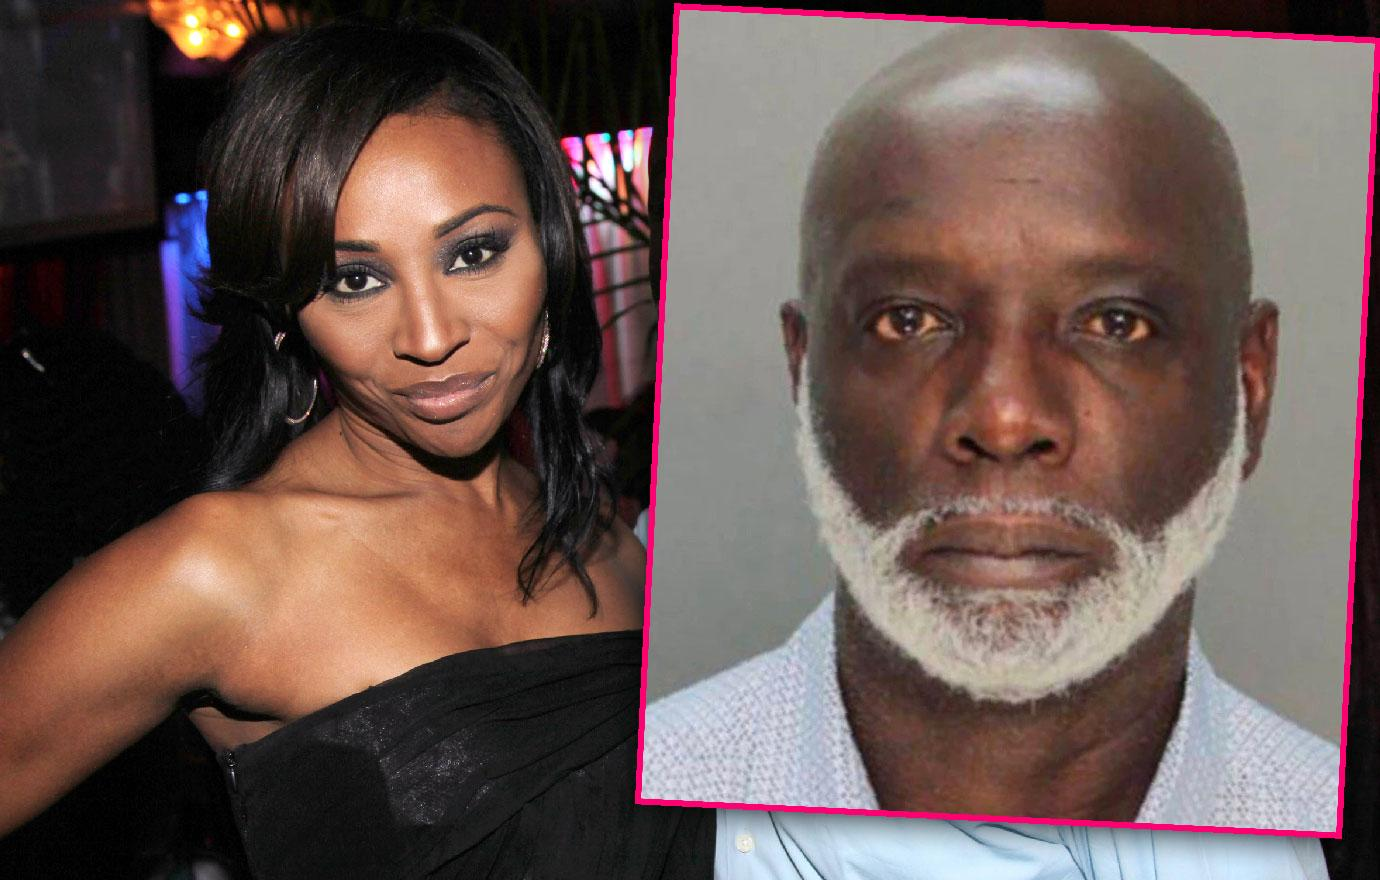 RHOA star Cynthia Bailey's Ex-Husband Peter Arrested